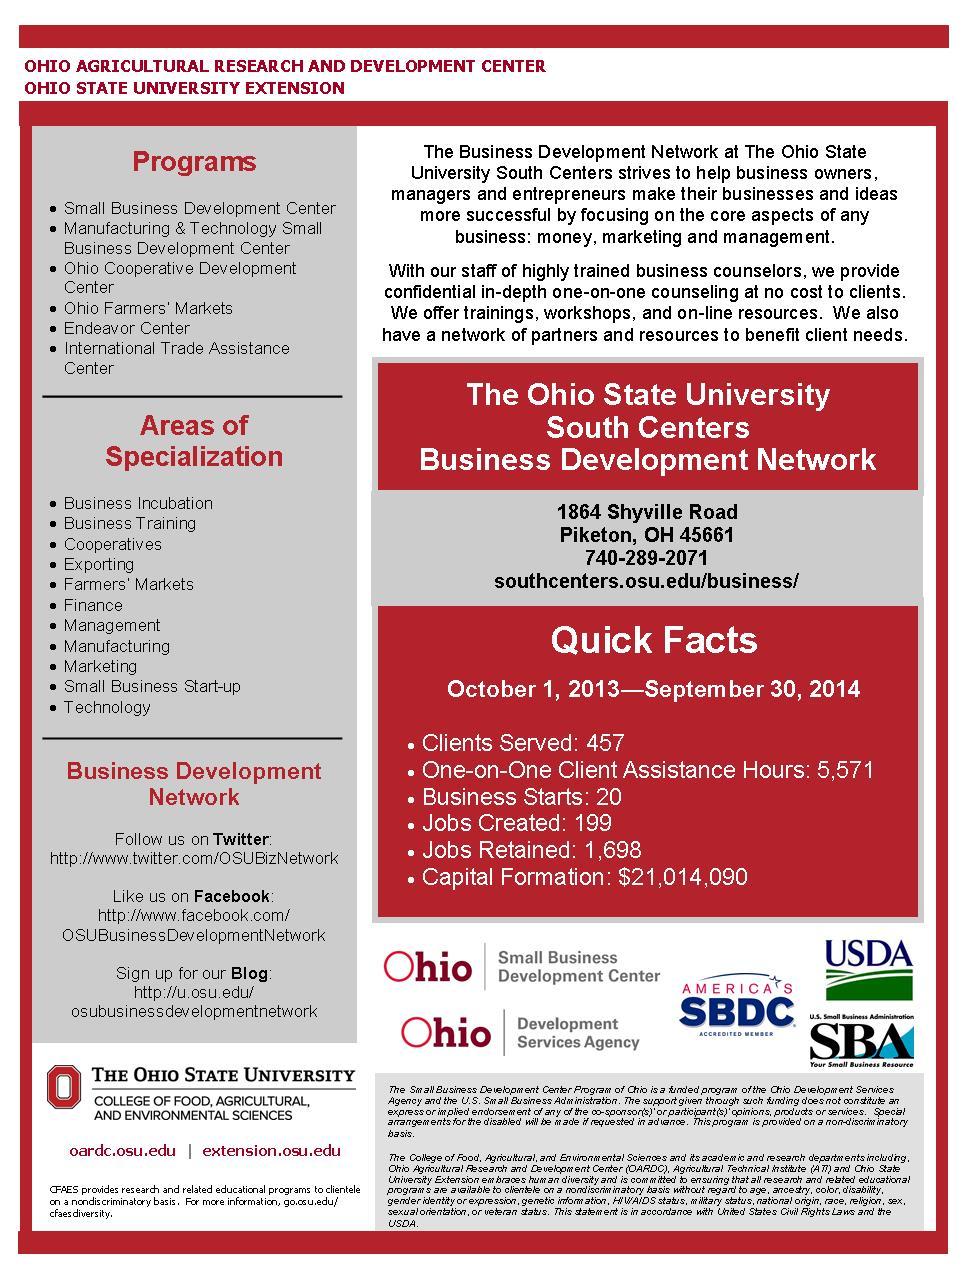 OSU South Centers impact | OSU South Centers Business